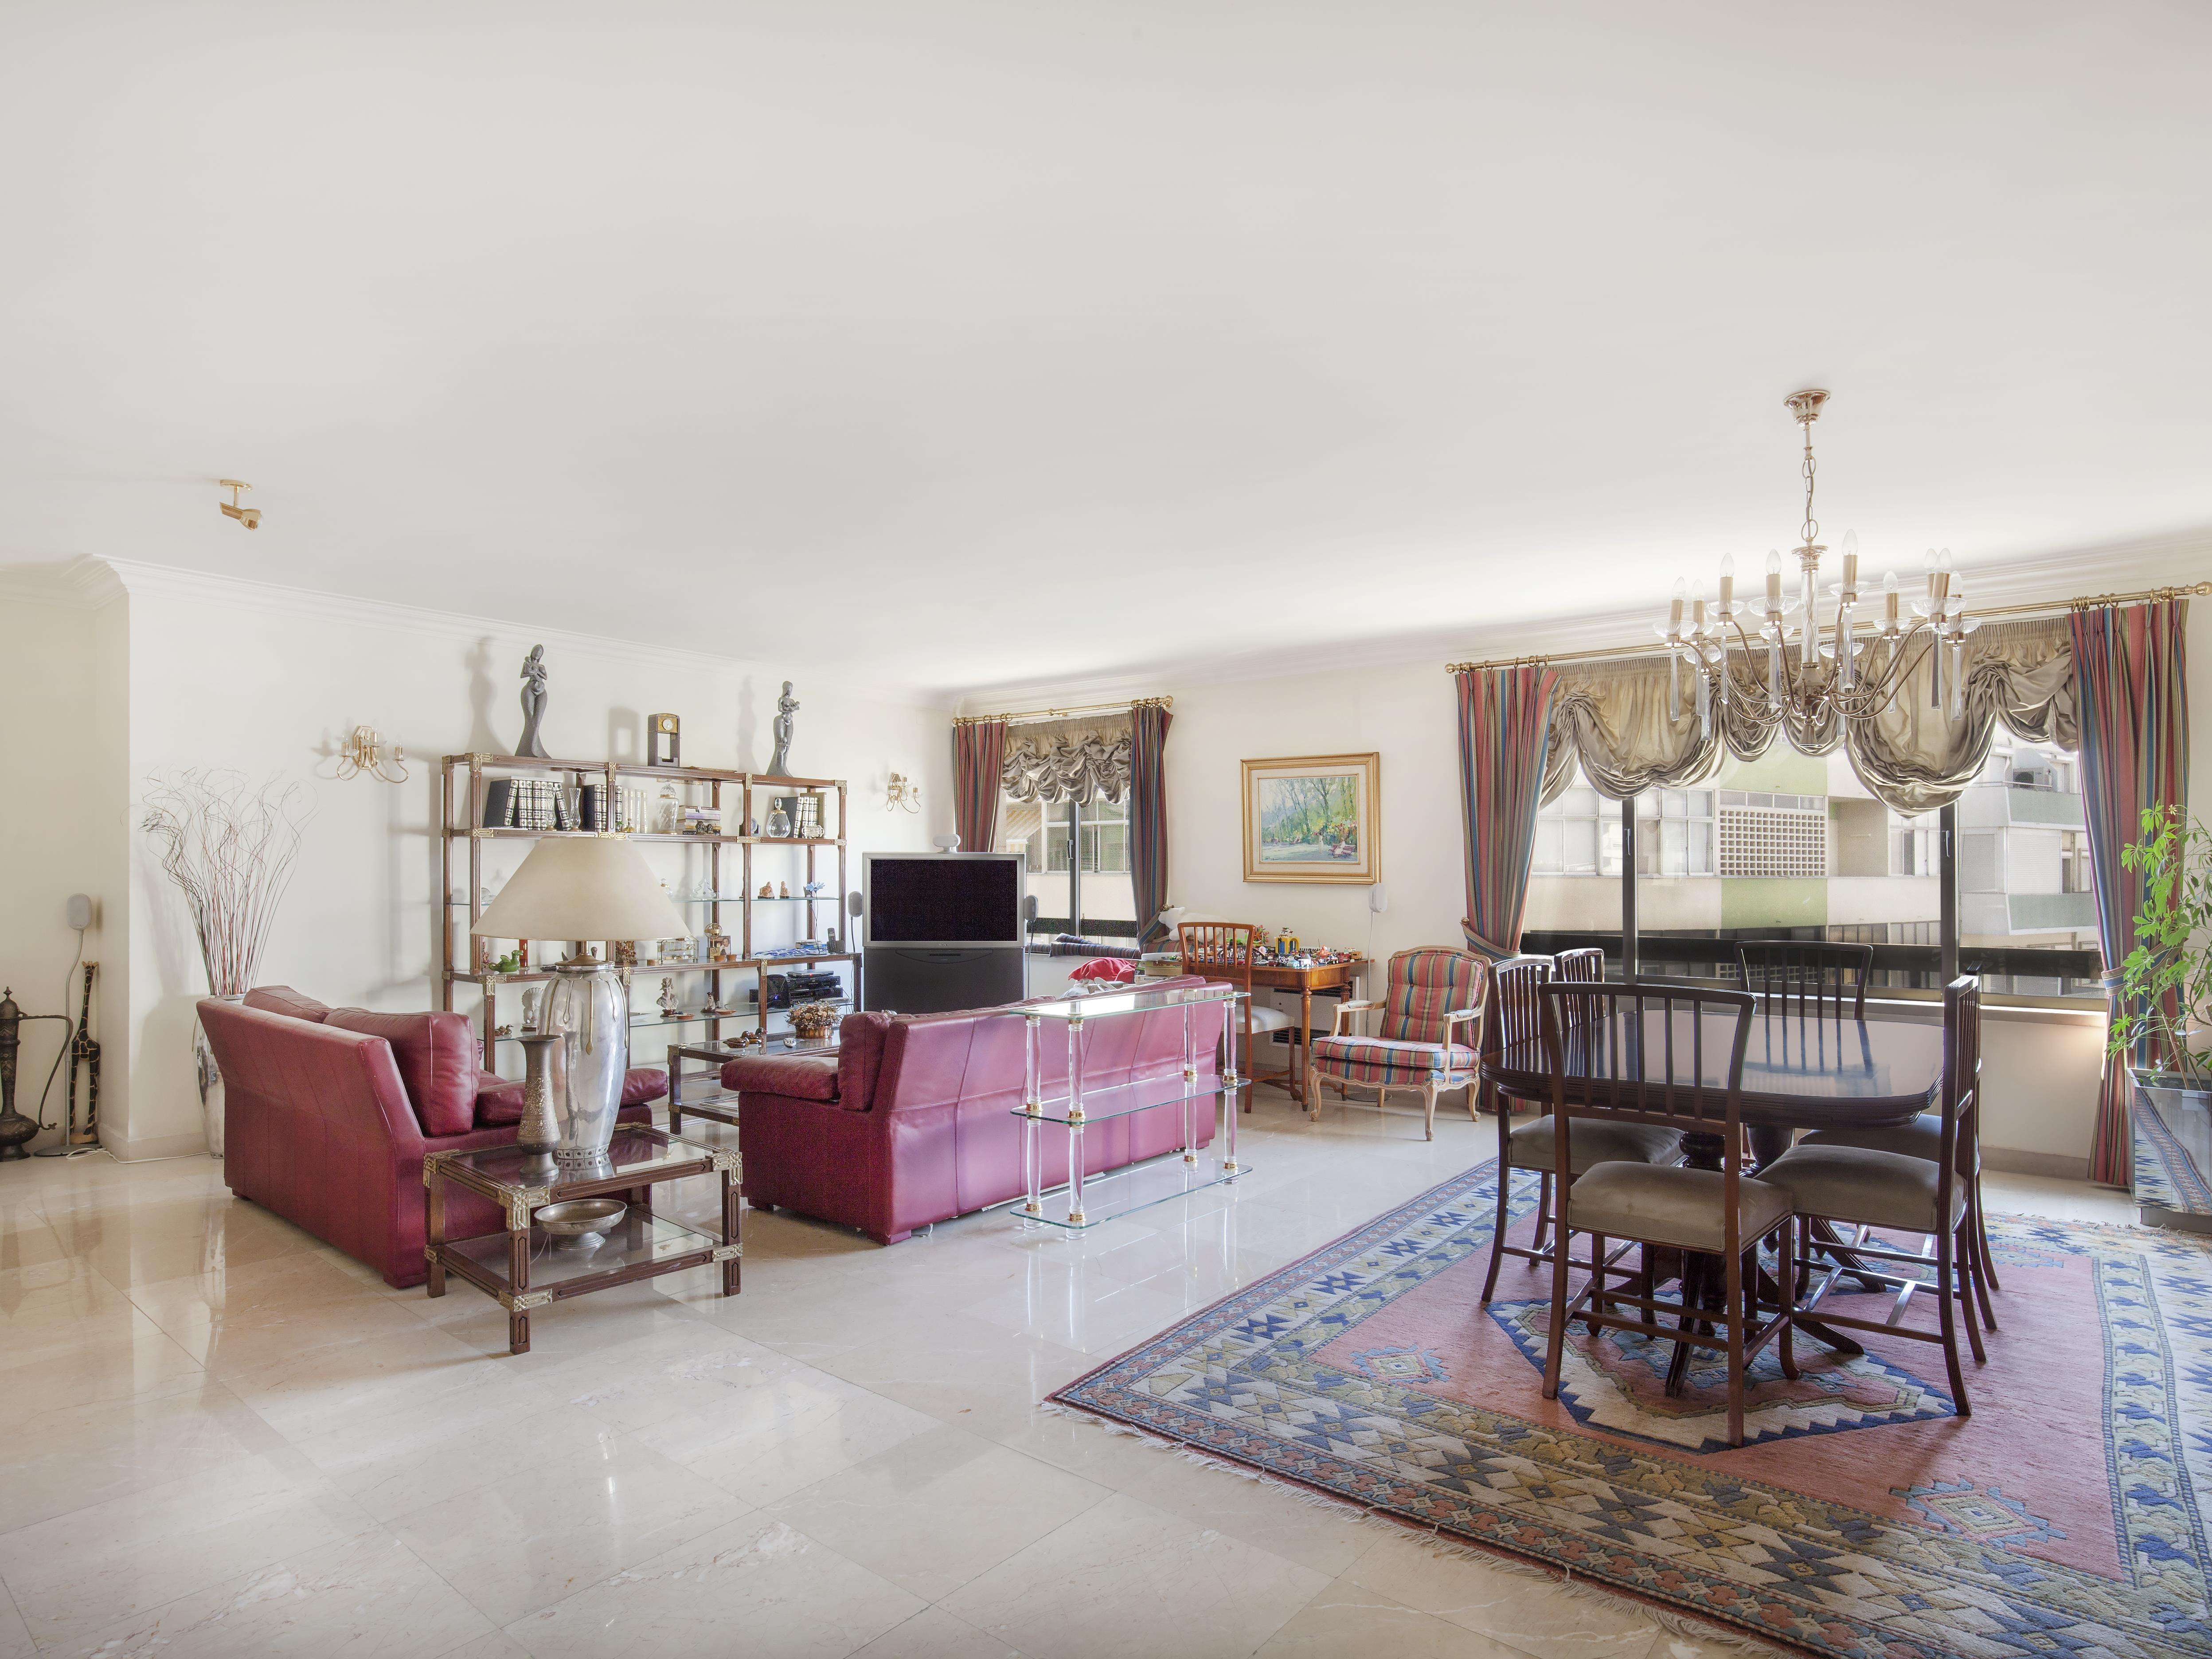 Apartment for Sale at Flat, 4 bedrooms, for Sale Lisboa, Lisboa, Portugal